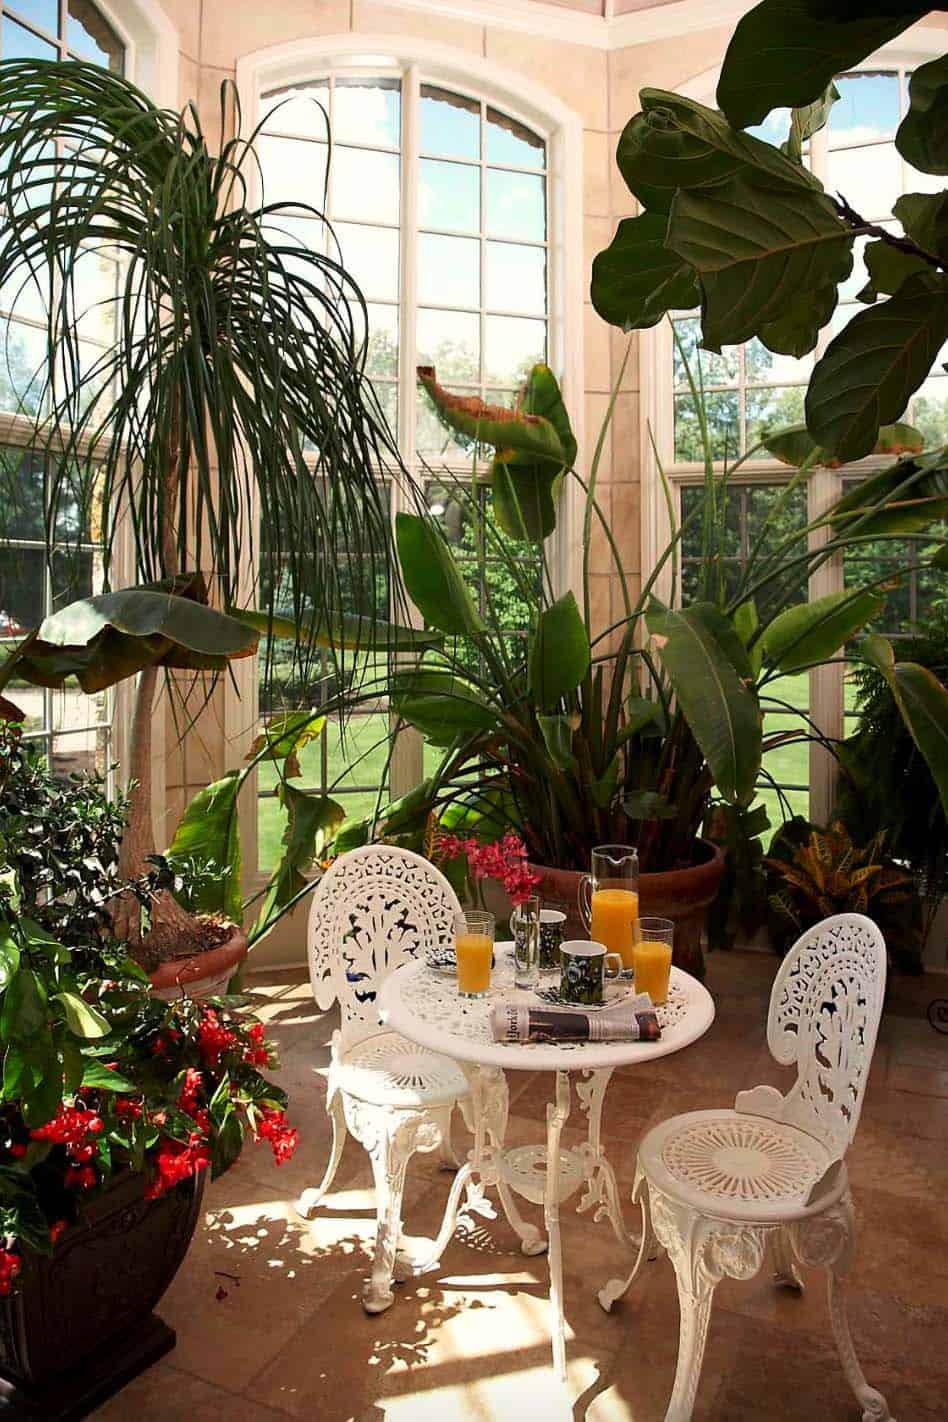 Amazing-Conservatory-Greenhouse-Ideas-16-1-Kindesign